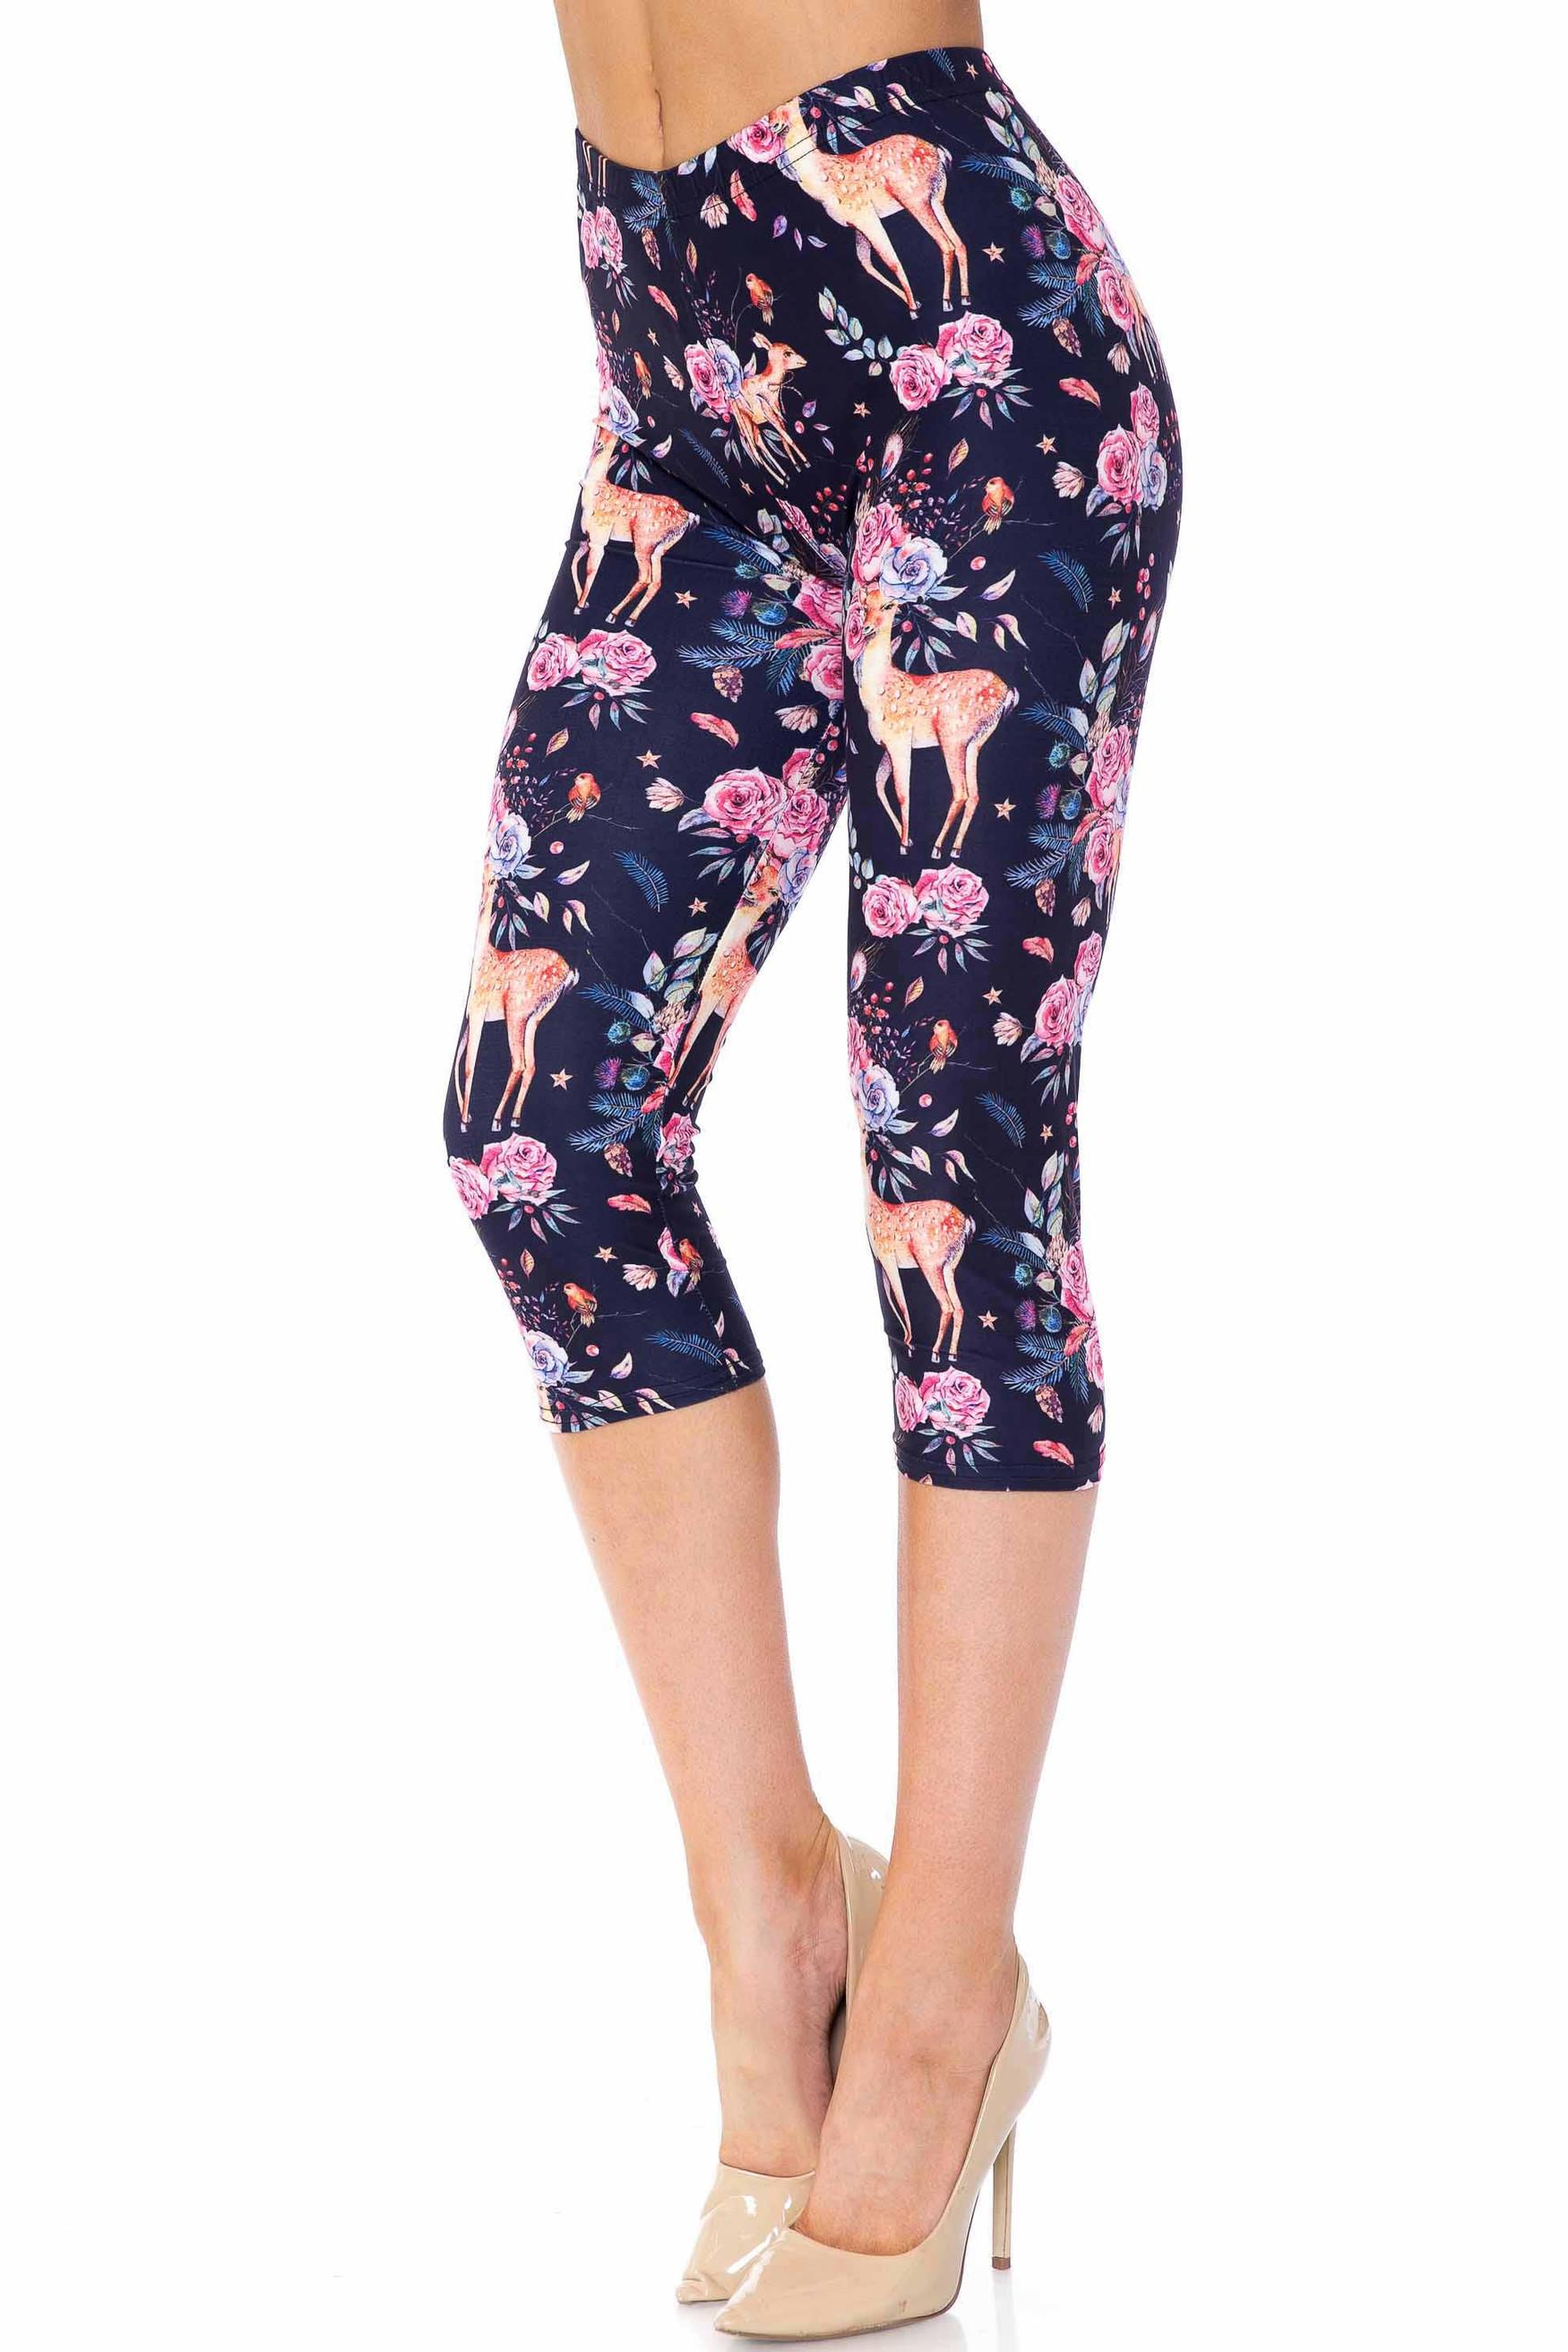 Creamy Soft Woodland Floral Fawn Plus Size Capris - USA Fashion™